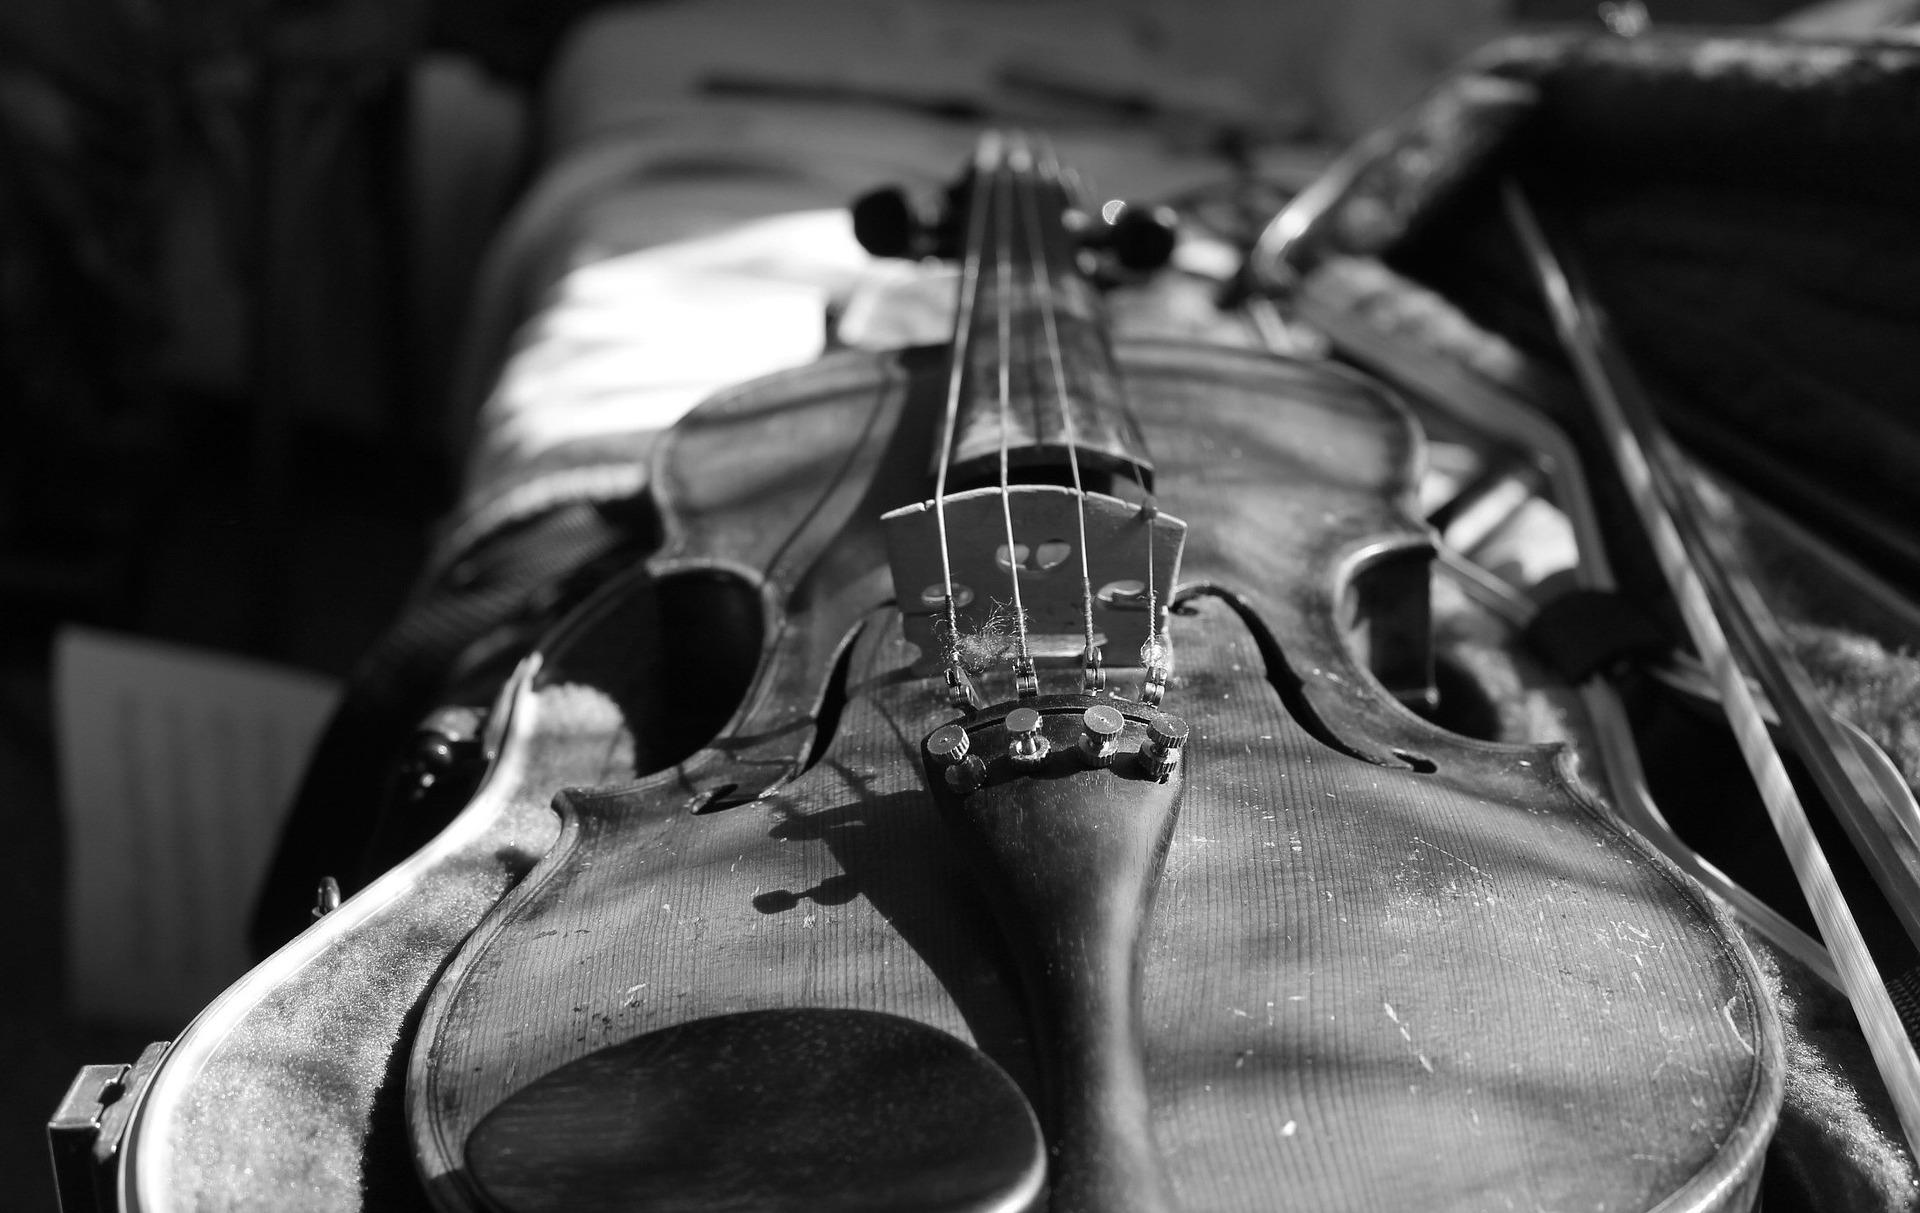 violin-1890247_1920.jpg